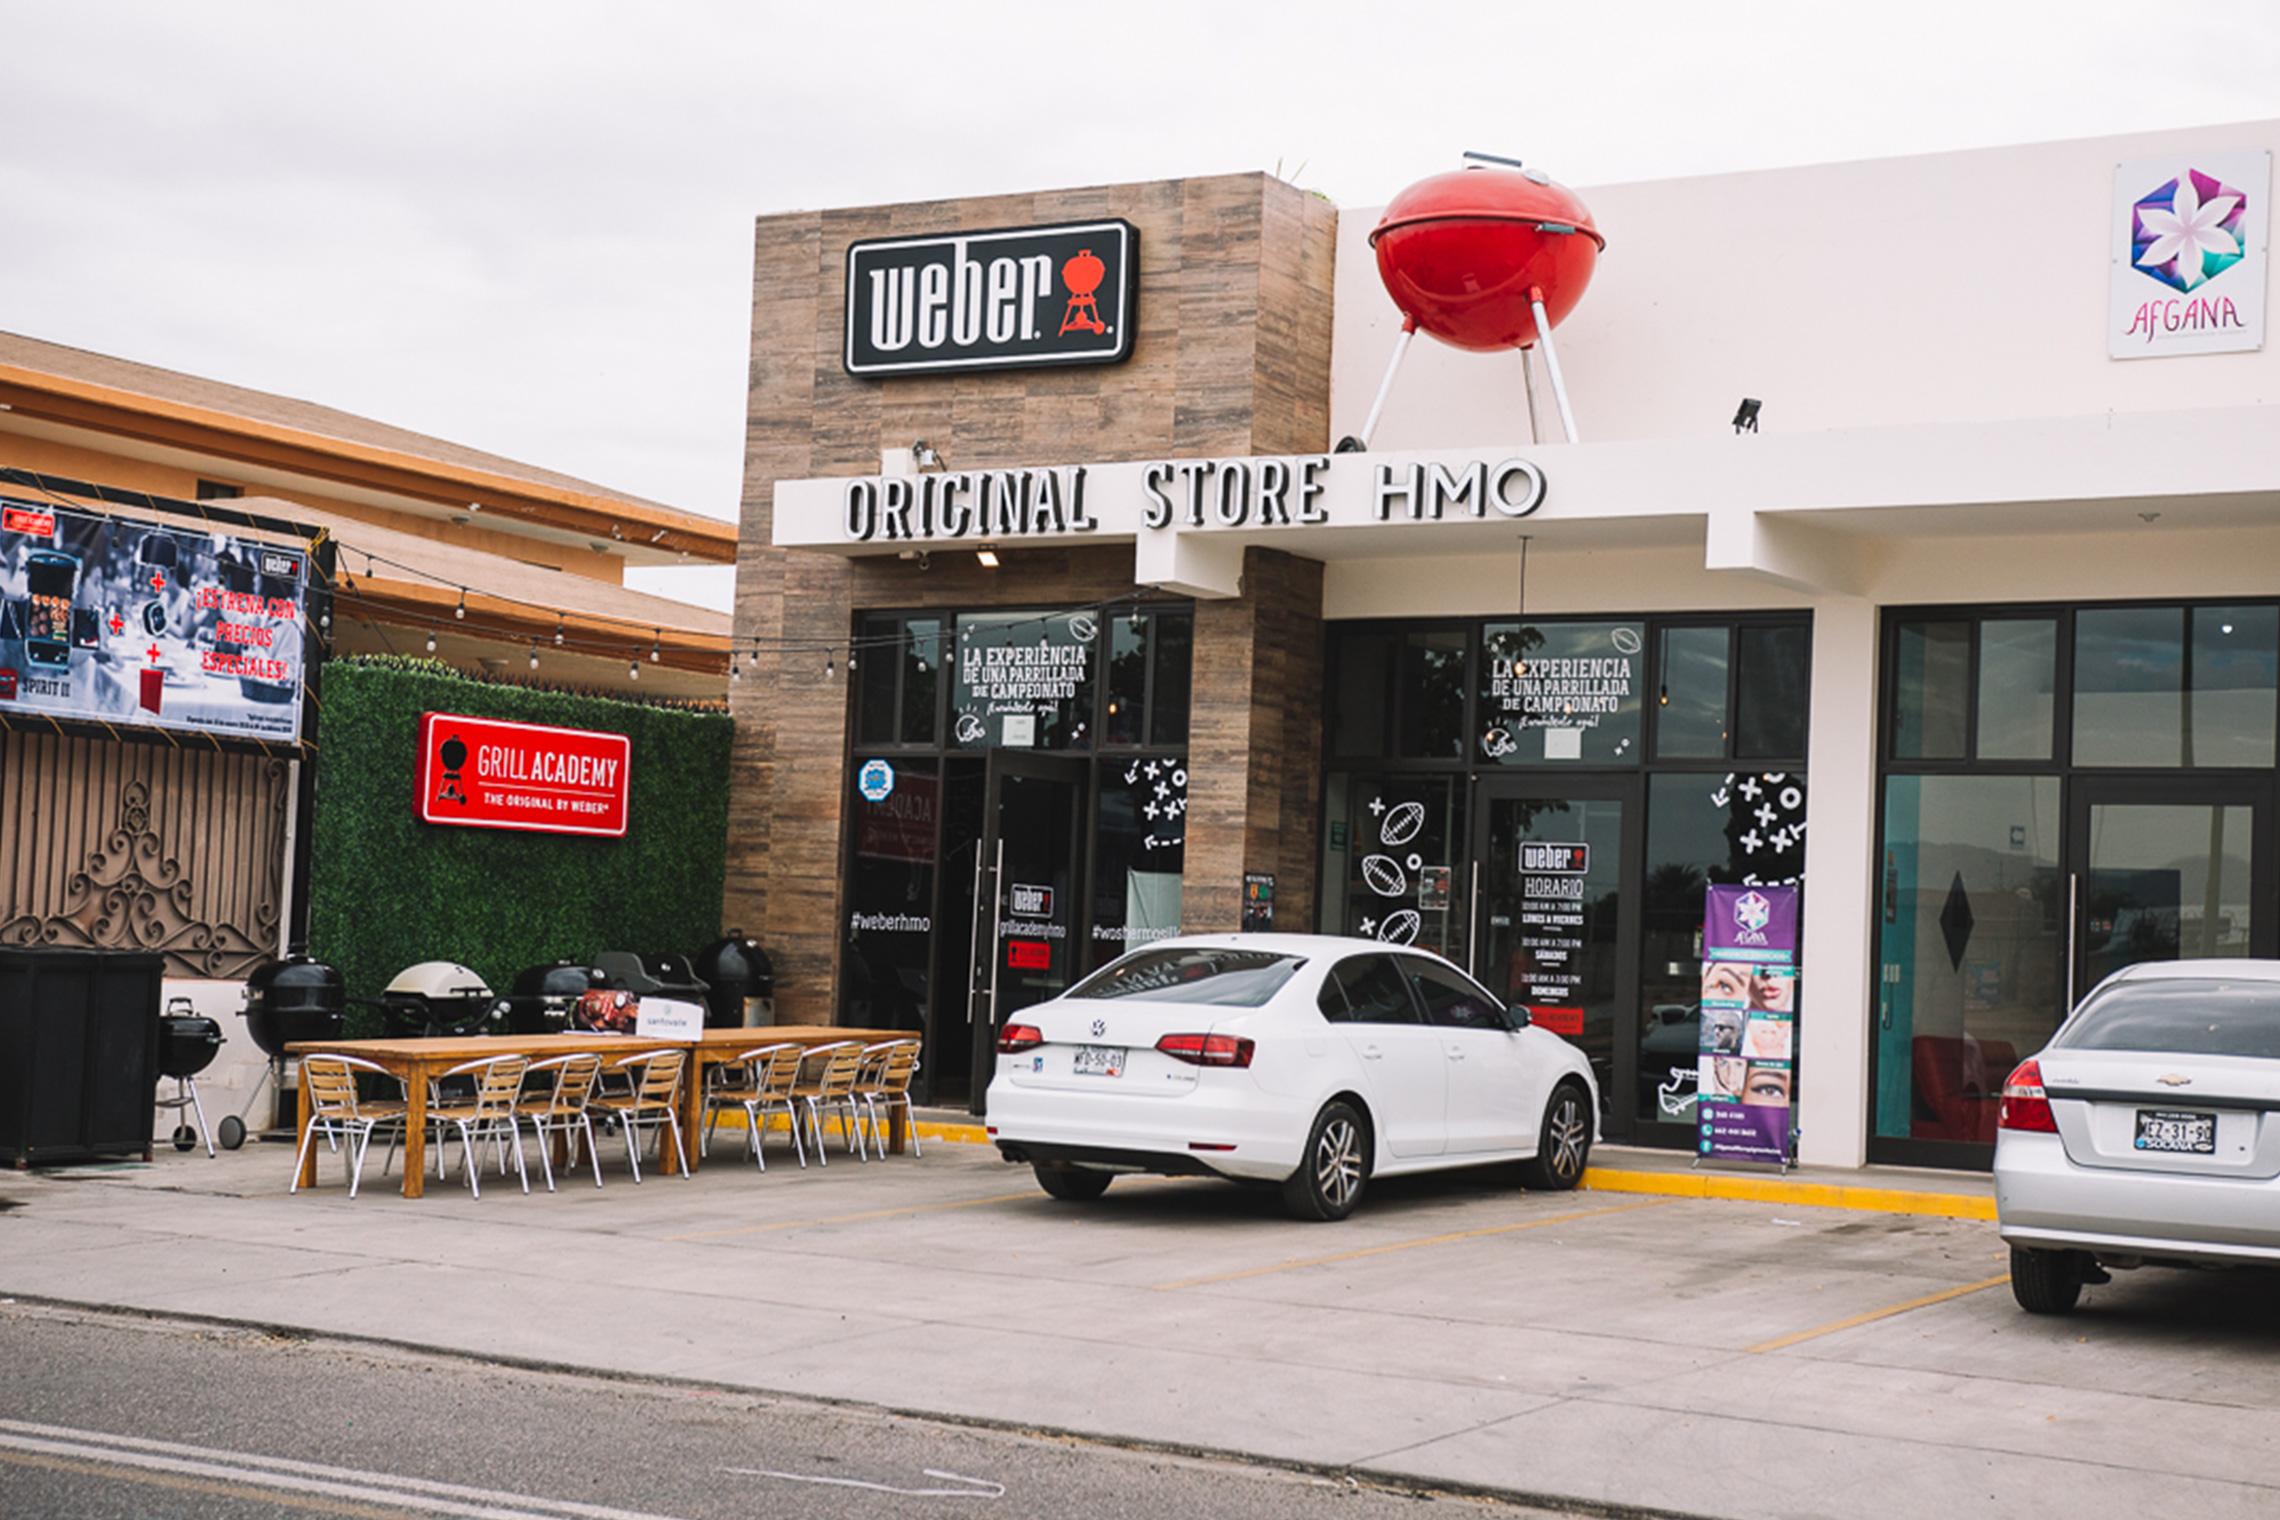 Weber Original Store Hermosillo